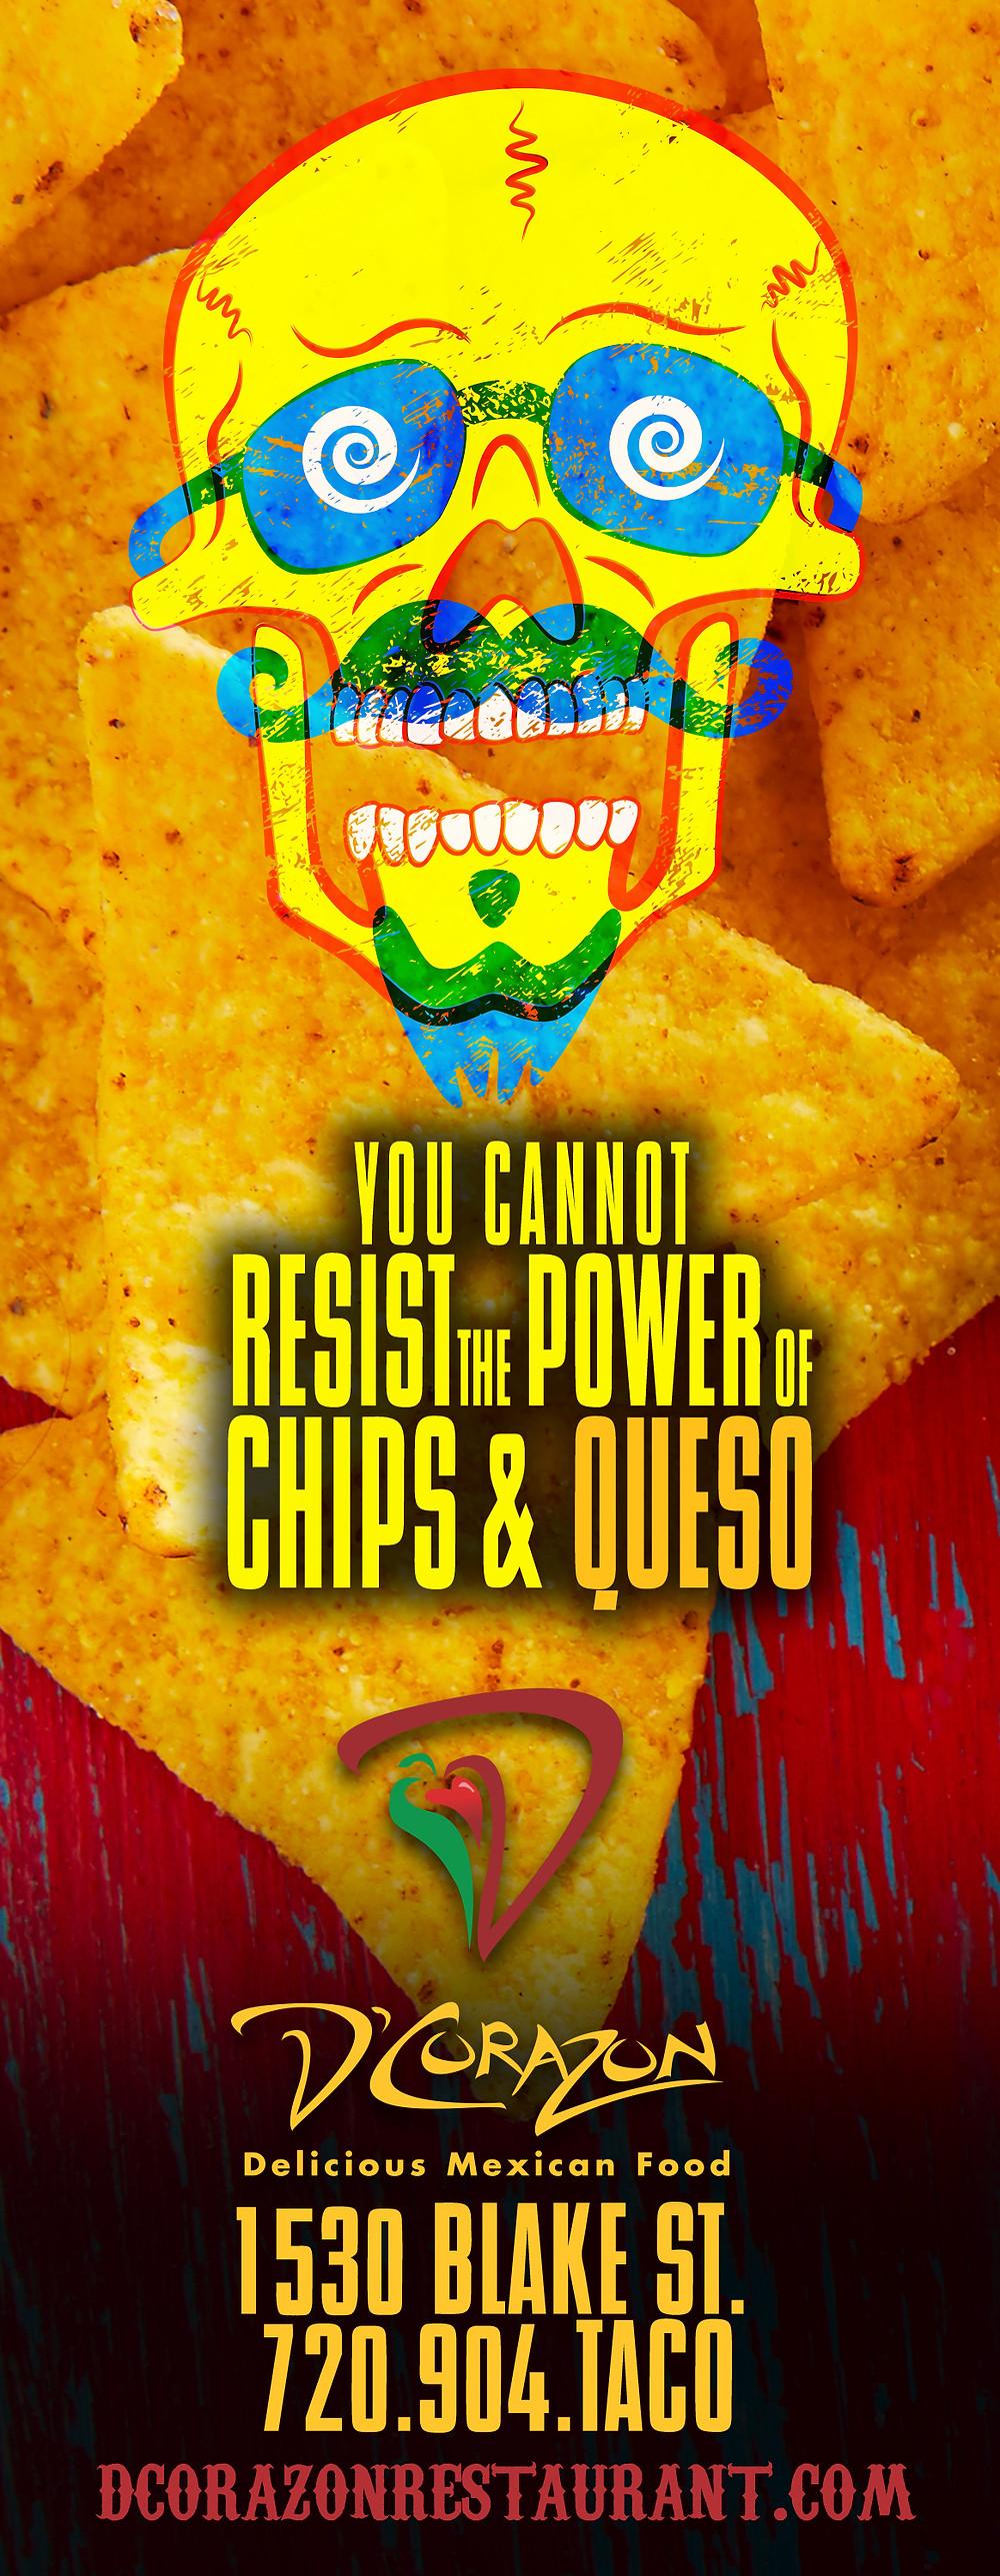 Denver Graphic Designer: Restaurant Ads for Westword - D'Corazon Ad